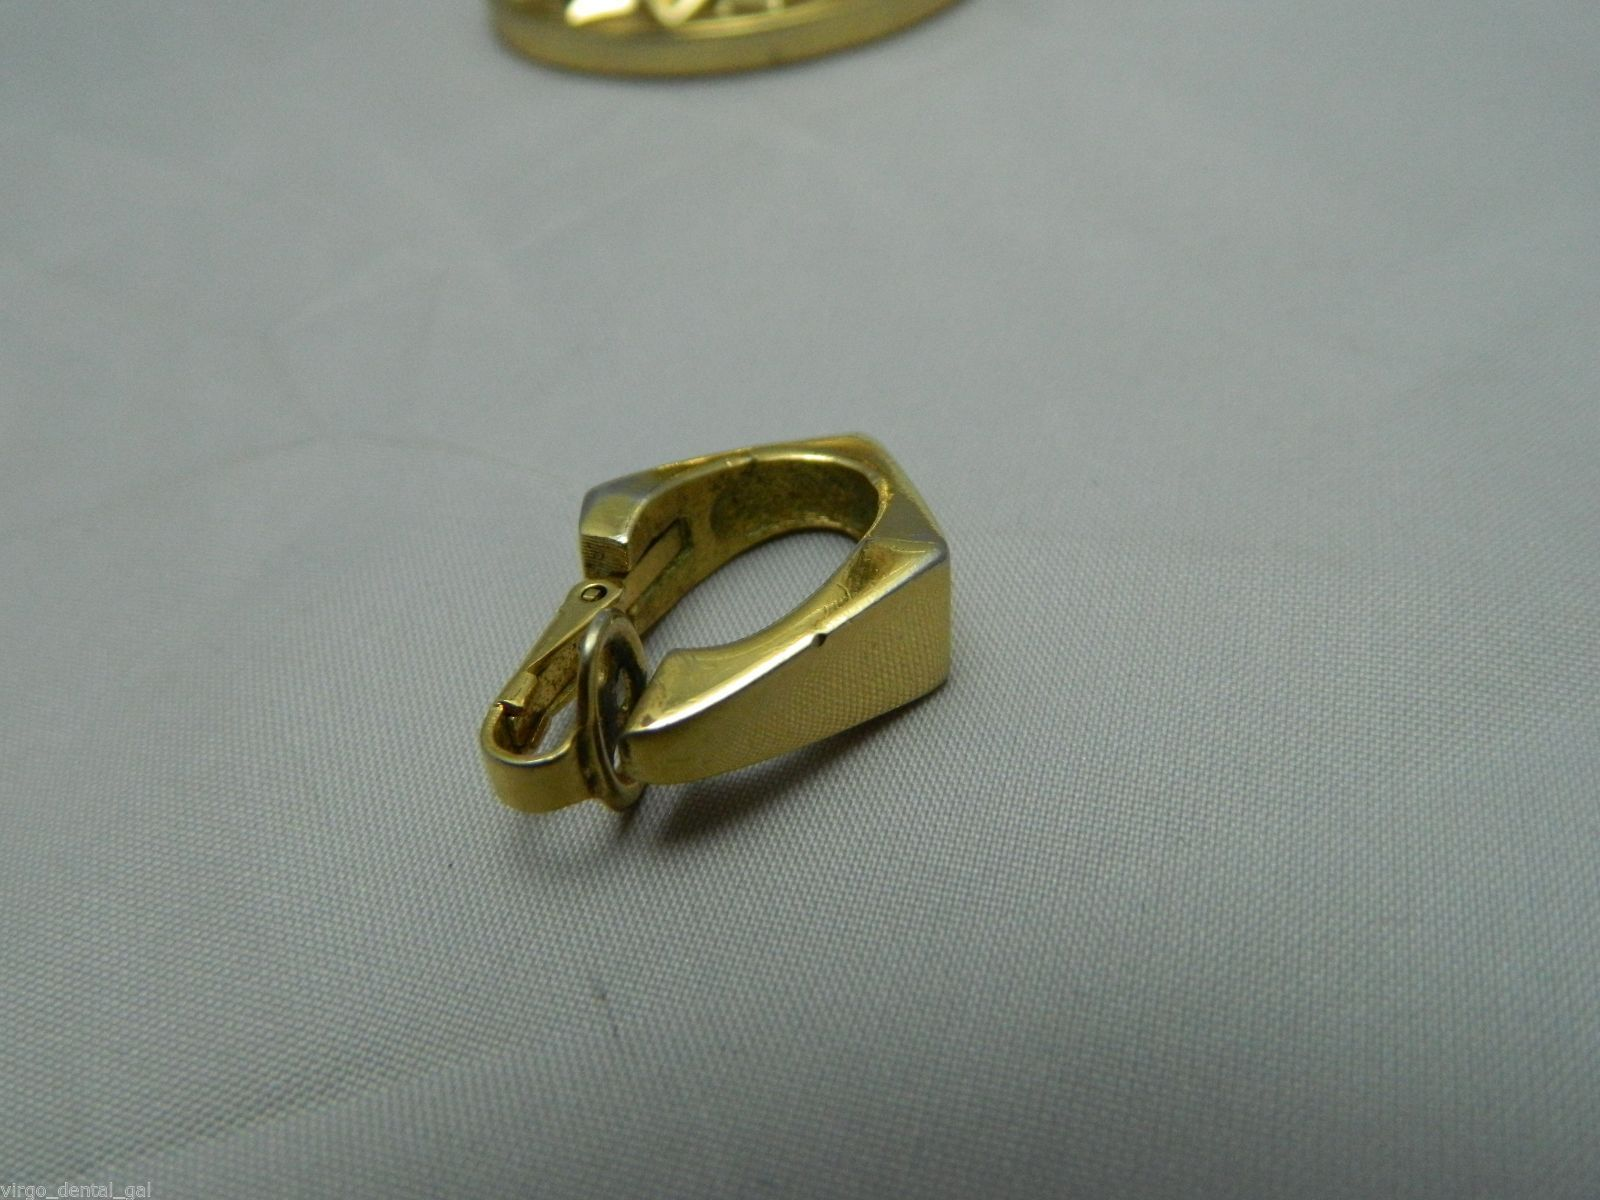 VTG TRIFARI Signed Gold Tone Modern Abstract Diamond Shape Clip Earrings